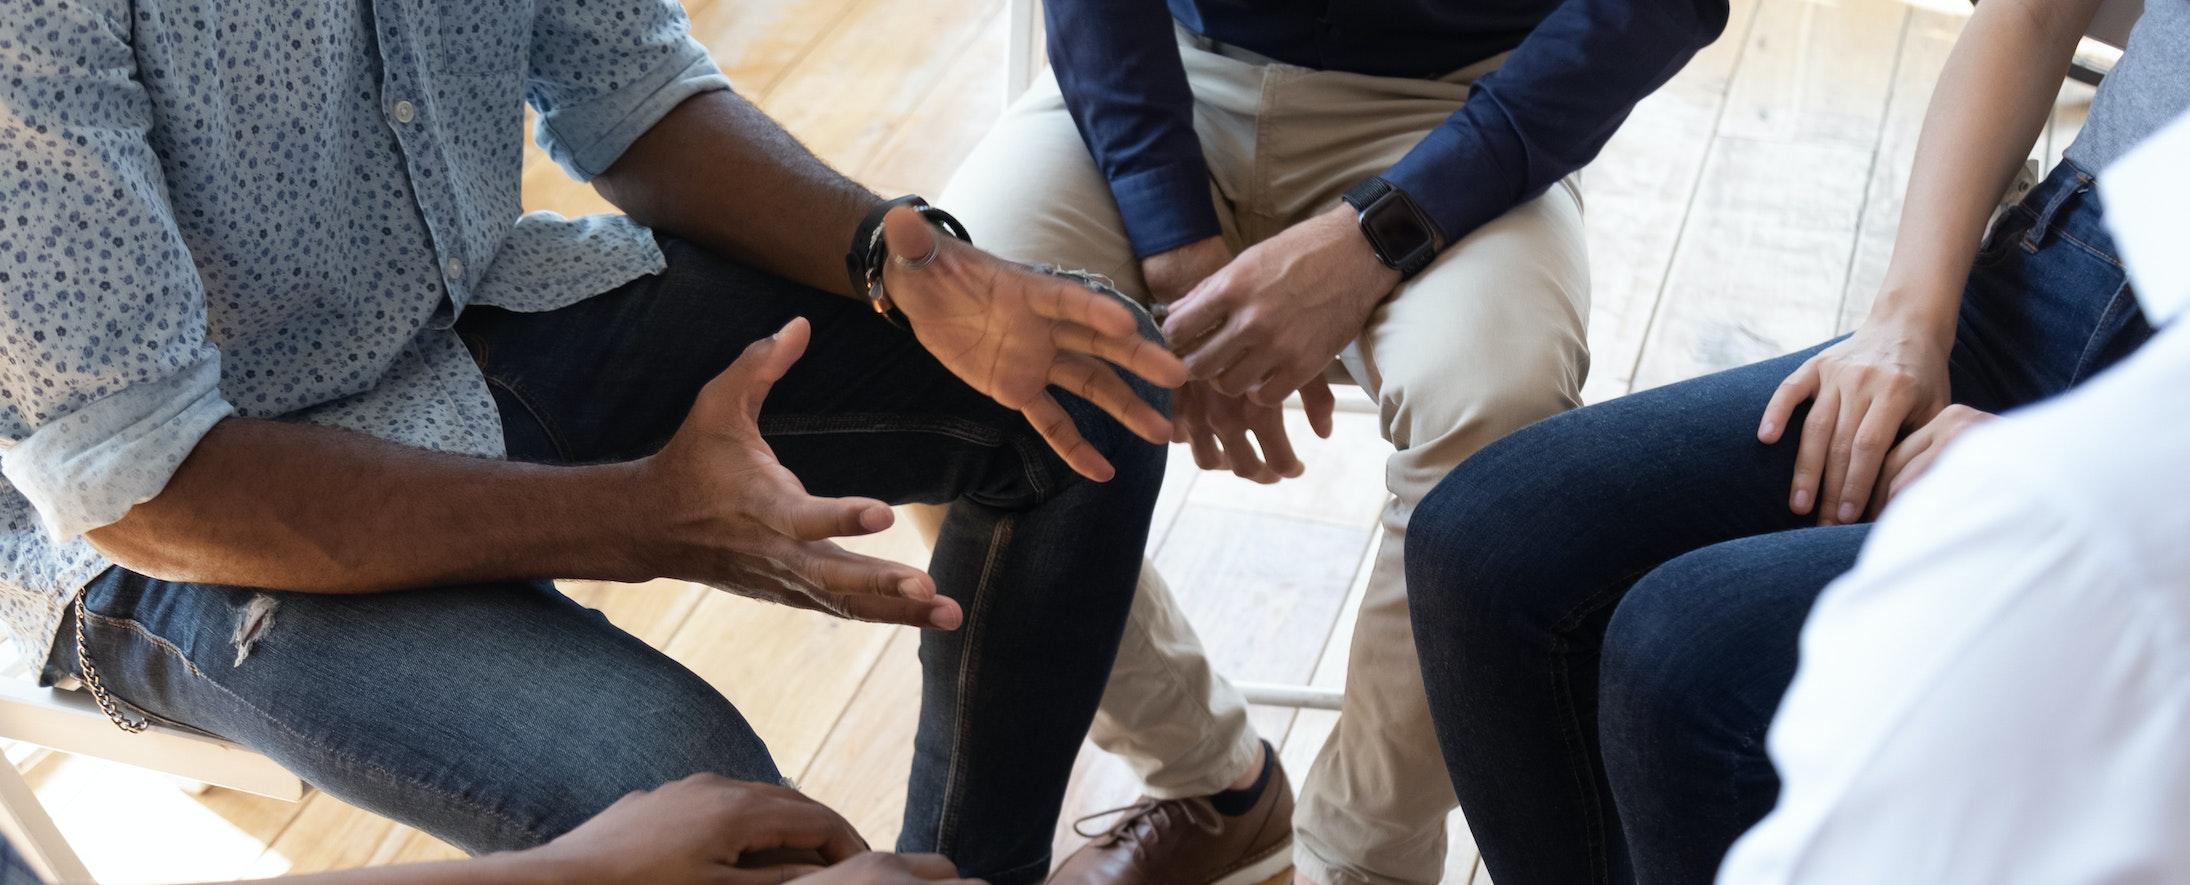 Psychotherapie (Gruppentherapie)